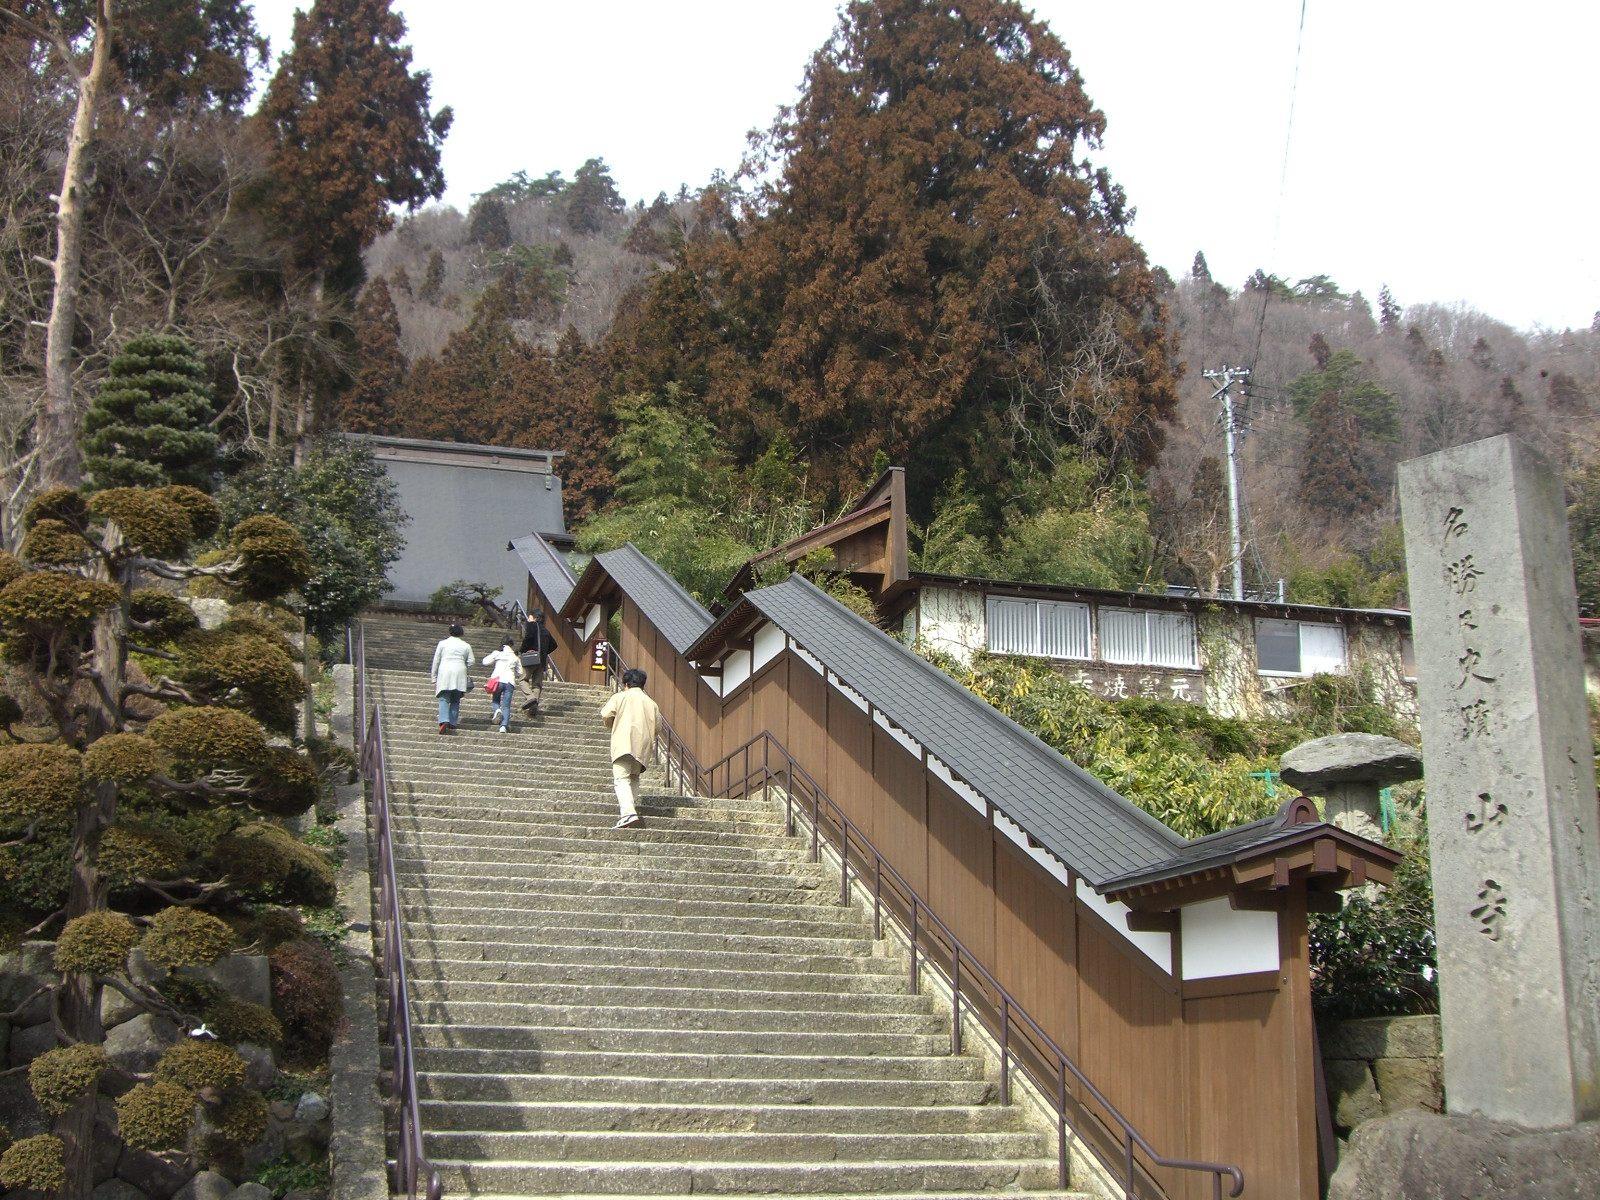 around 1000 stairs to climb